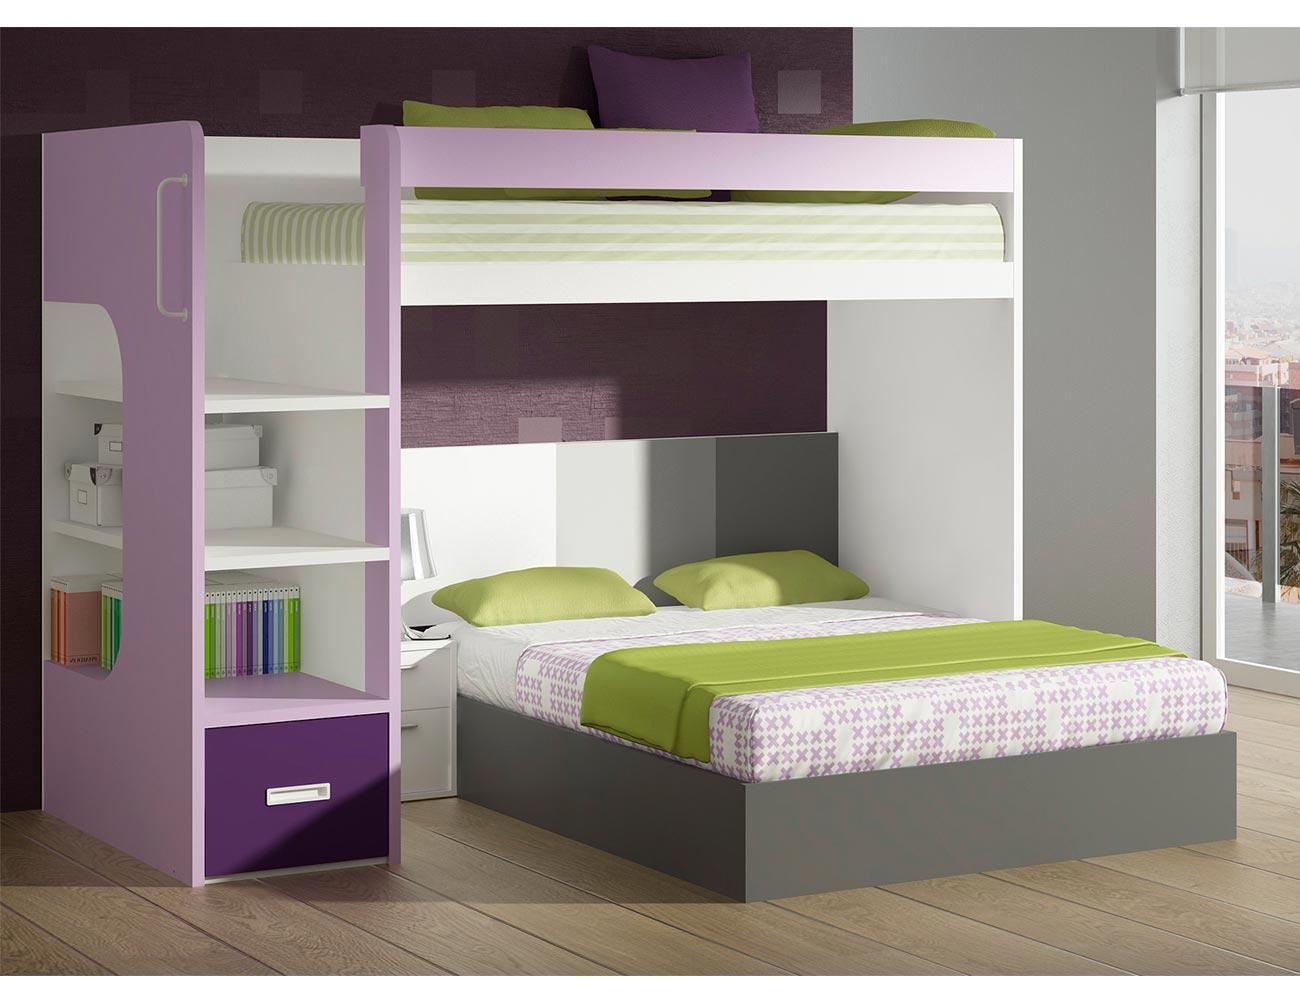 Dormitorio juvenil litera barandilla cama matrimonio